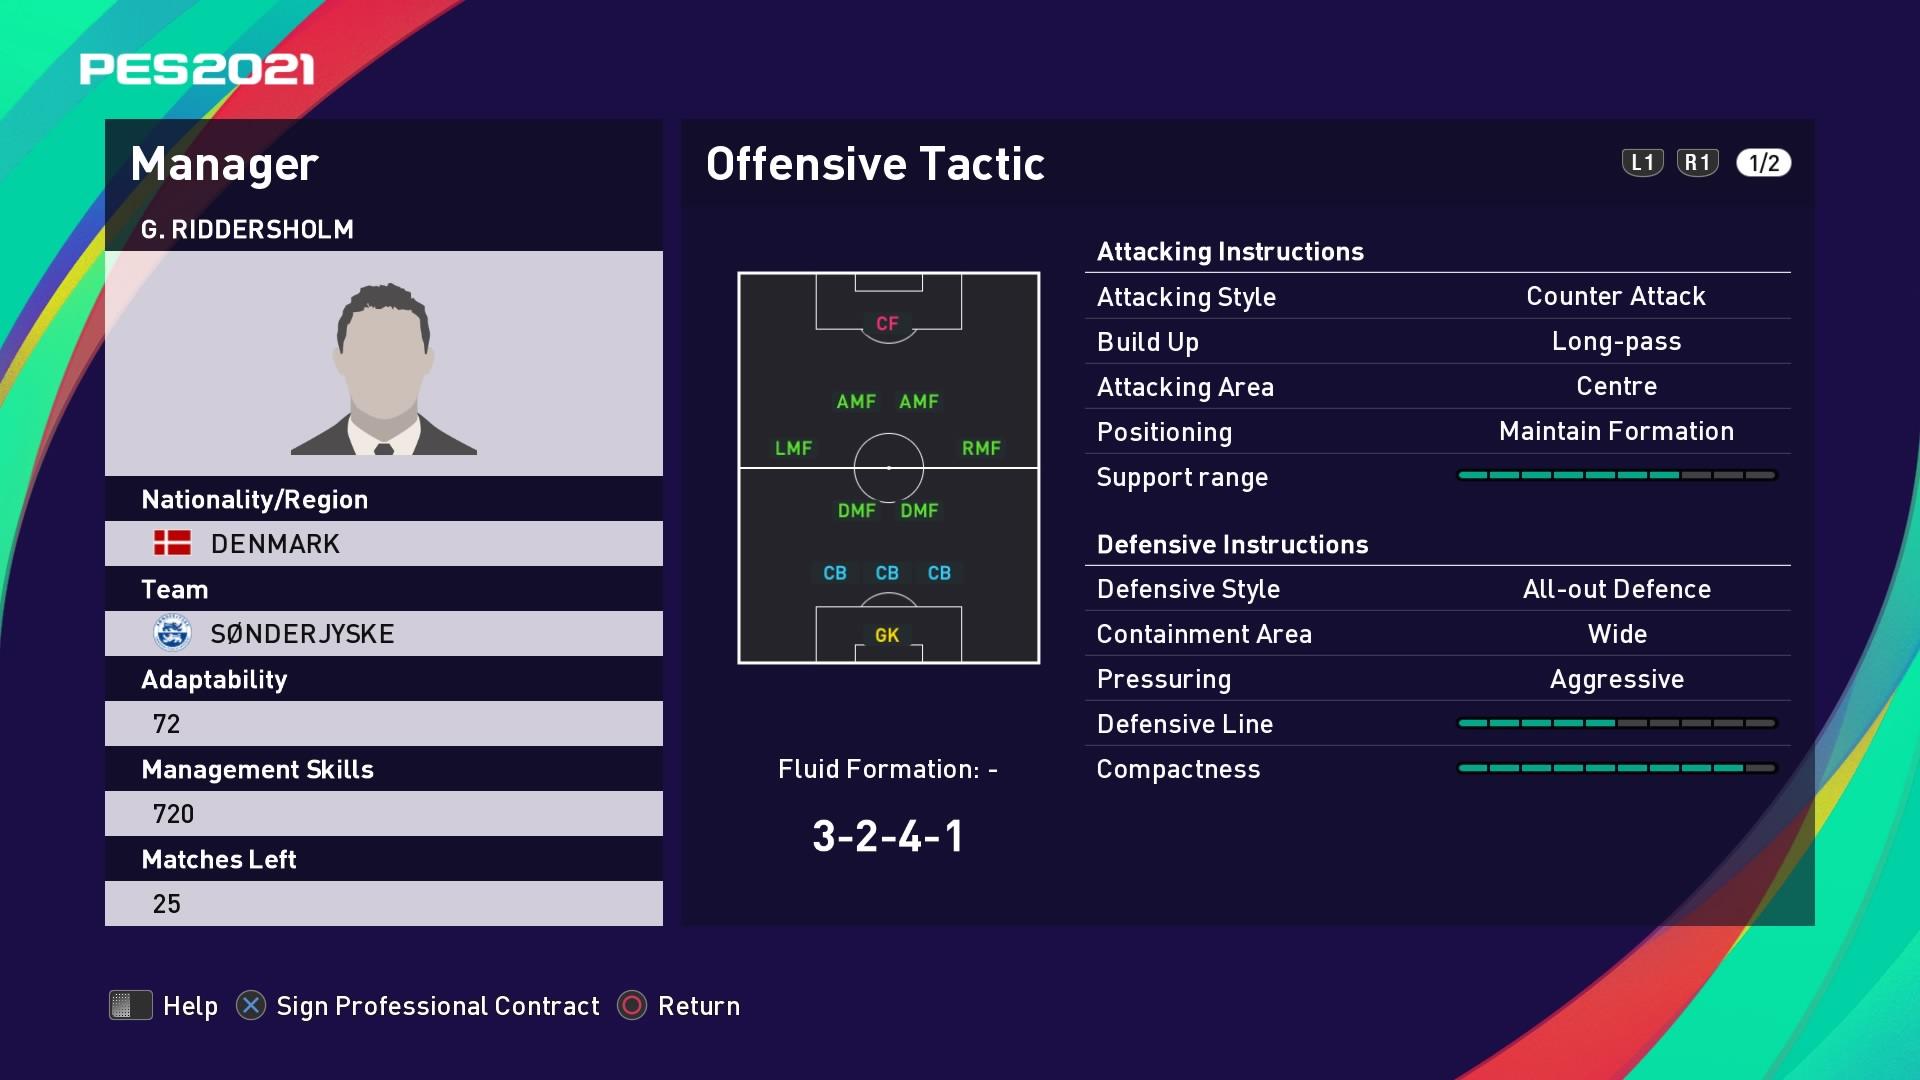 G. Riddersholm (Glen Riddersholm) Offensive Tactic in PES 2021 myClub